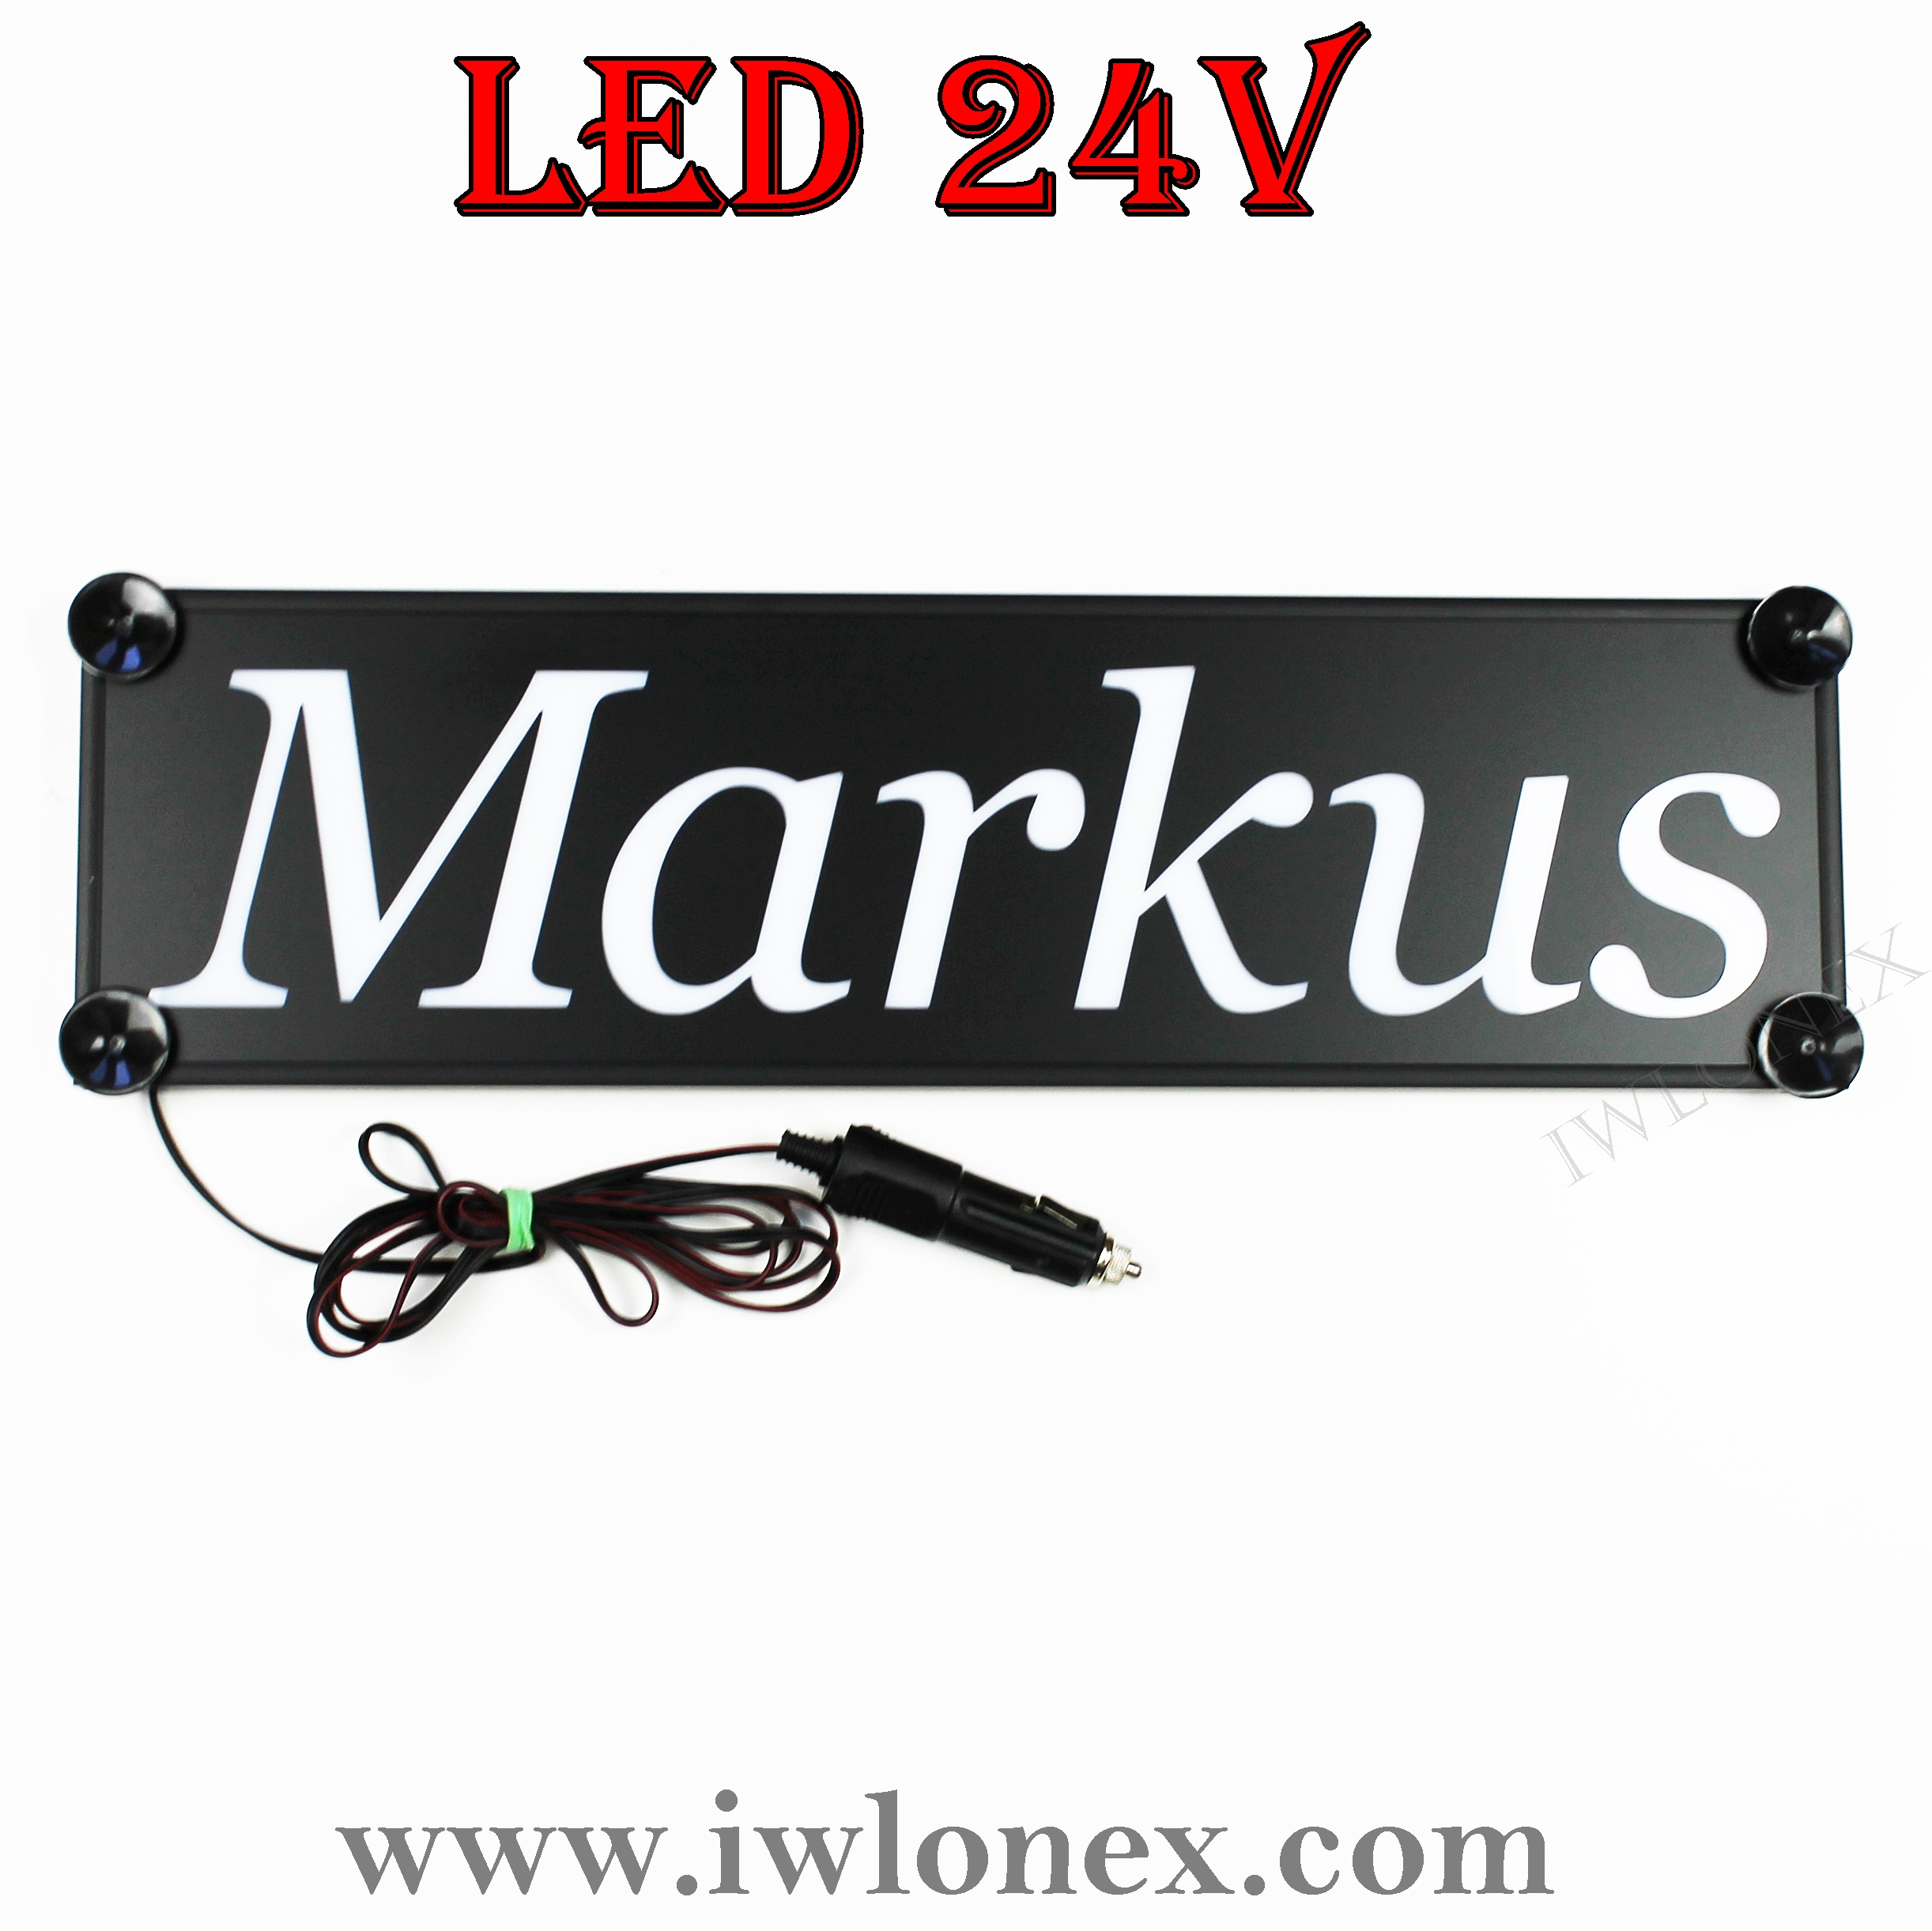 IMG 0754 - 1 LKW LED NAMENSCHILD 24V MARKUS